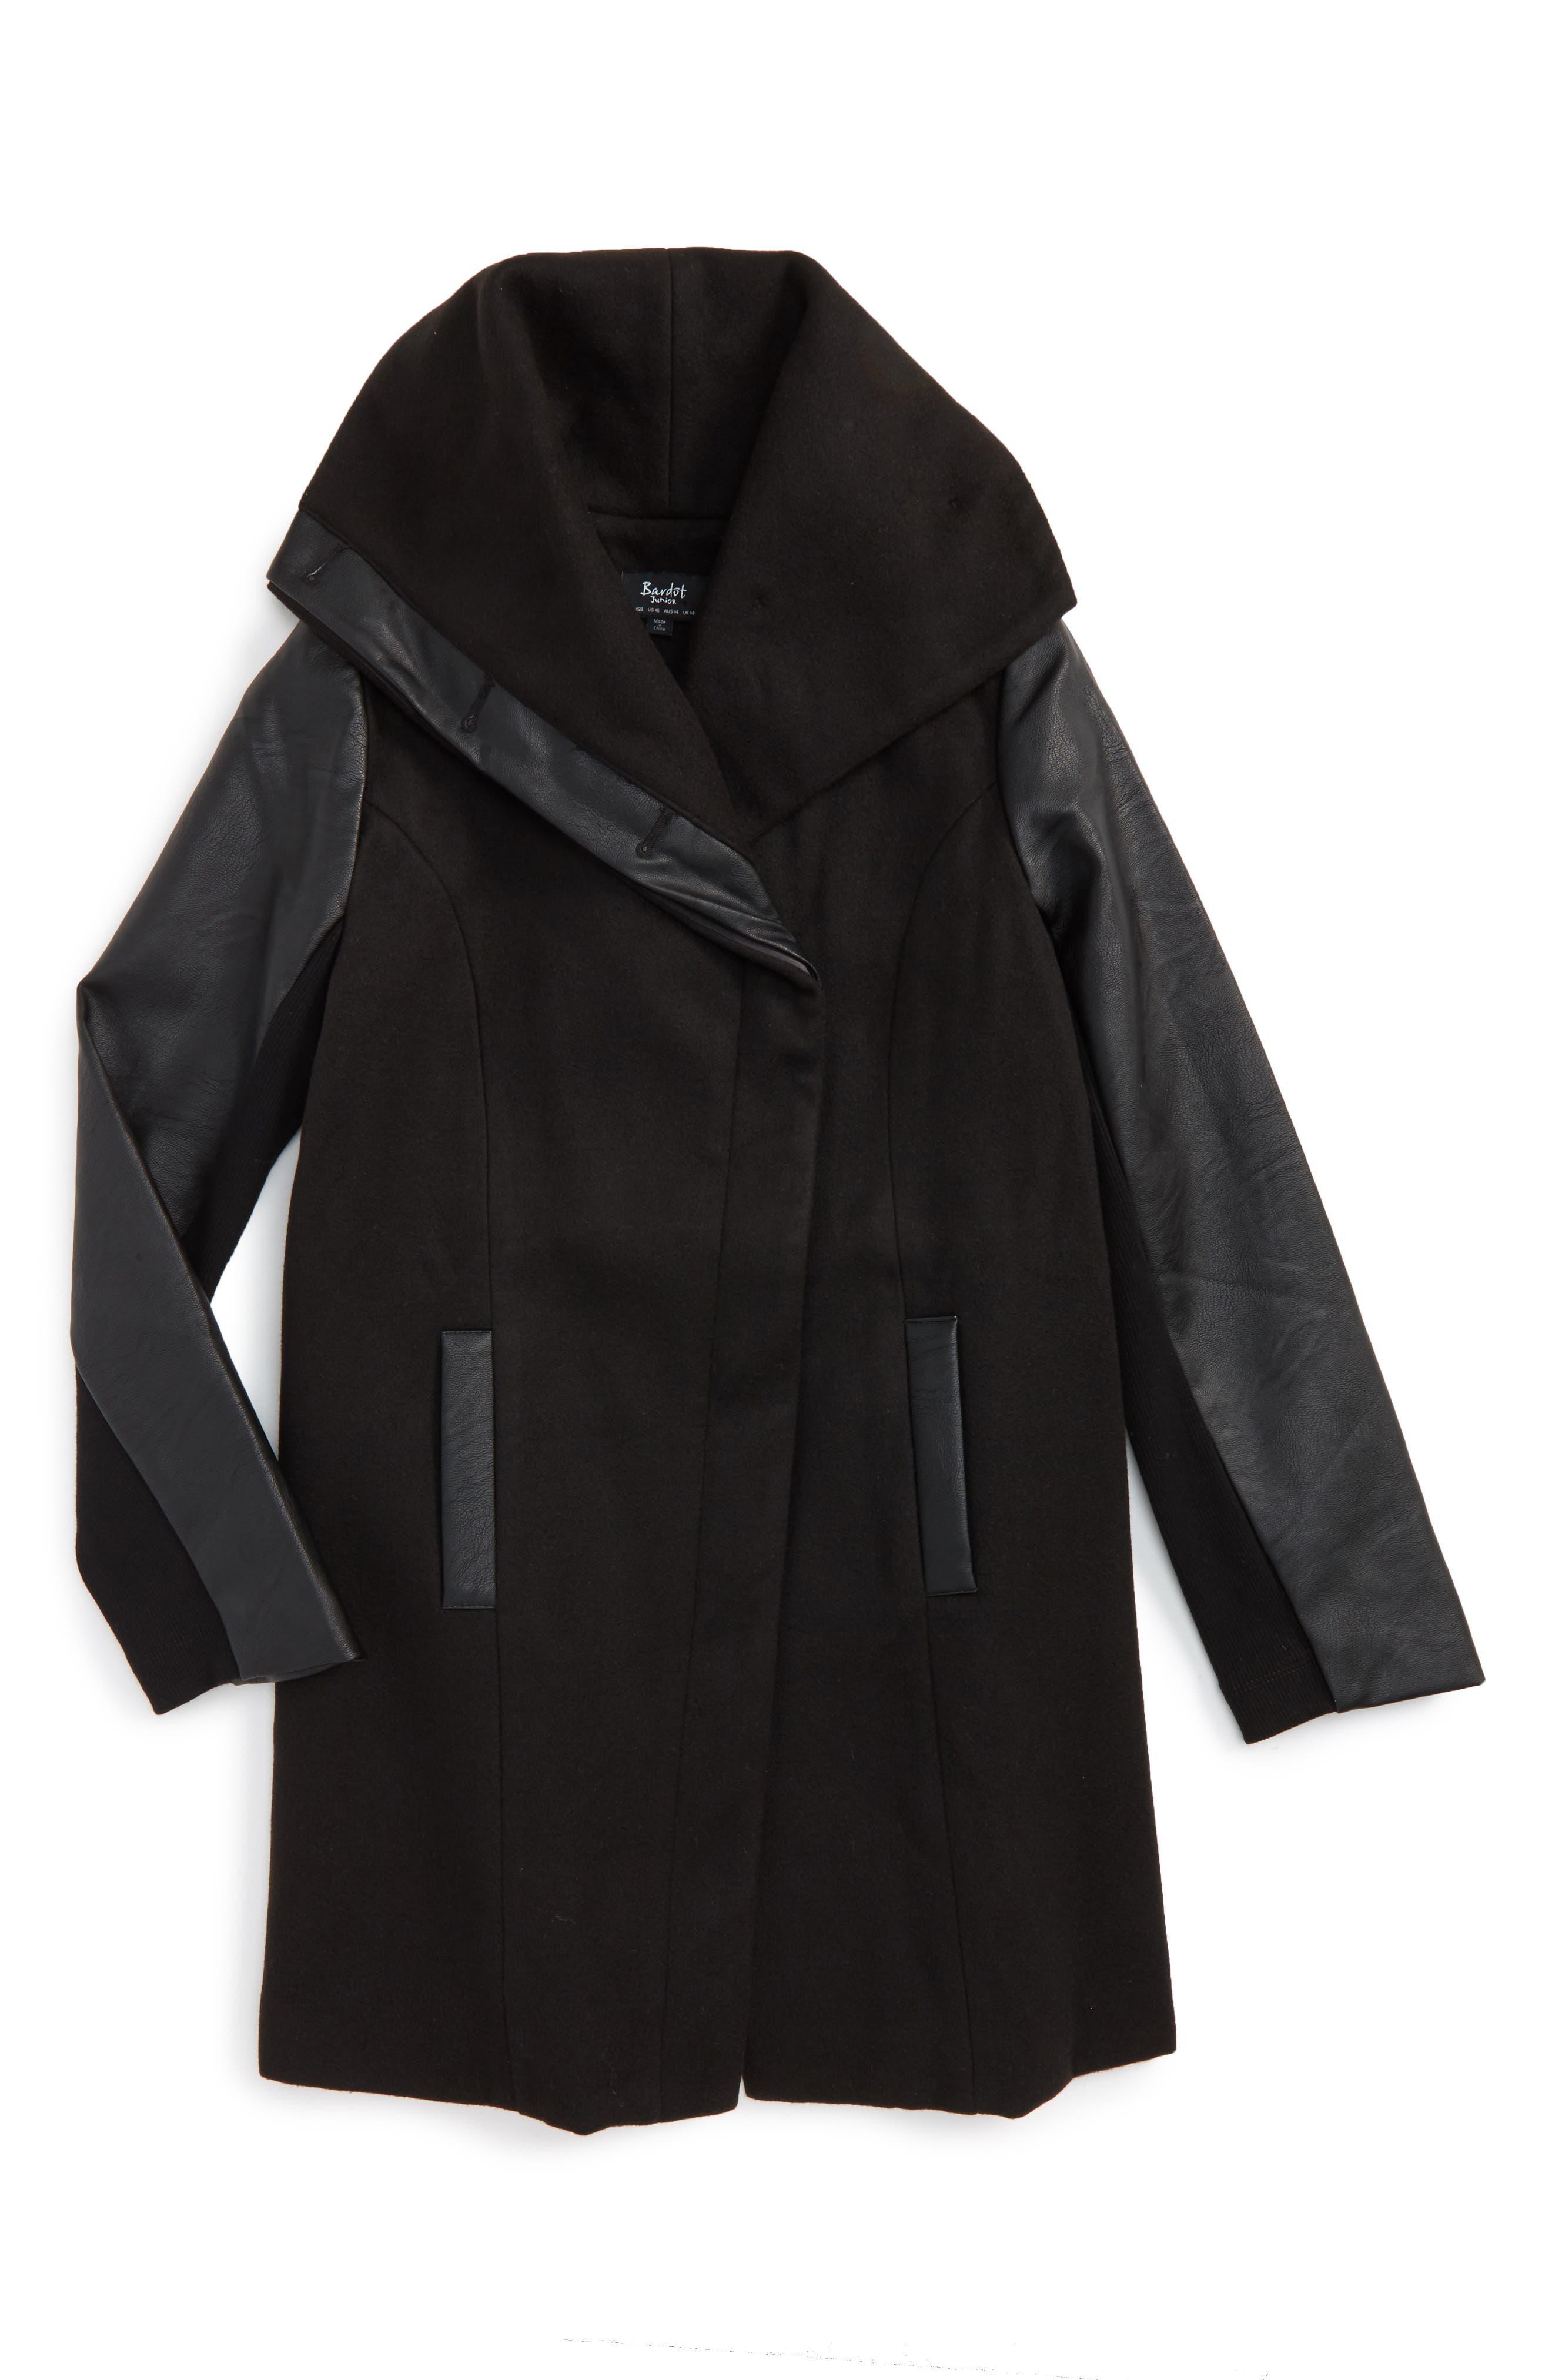 Main Image - Bardot Junior Raven Hooded Coat (Big Girls)